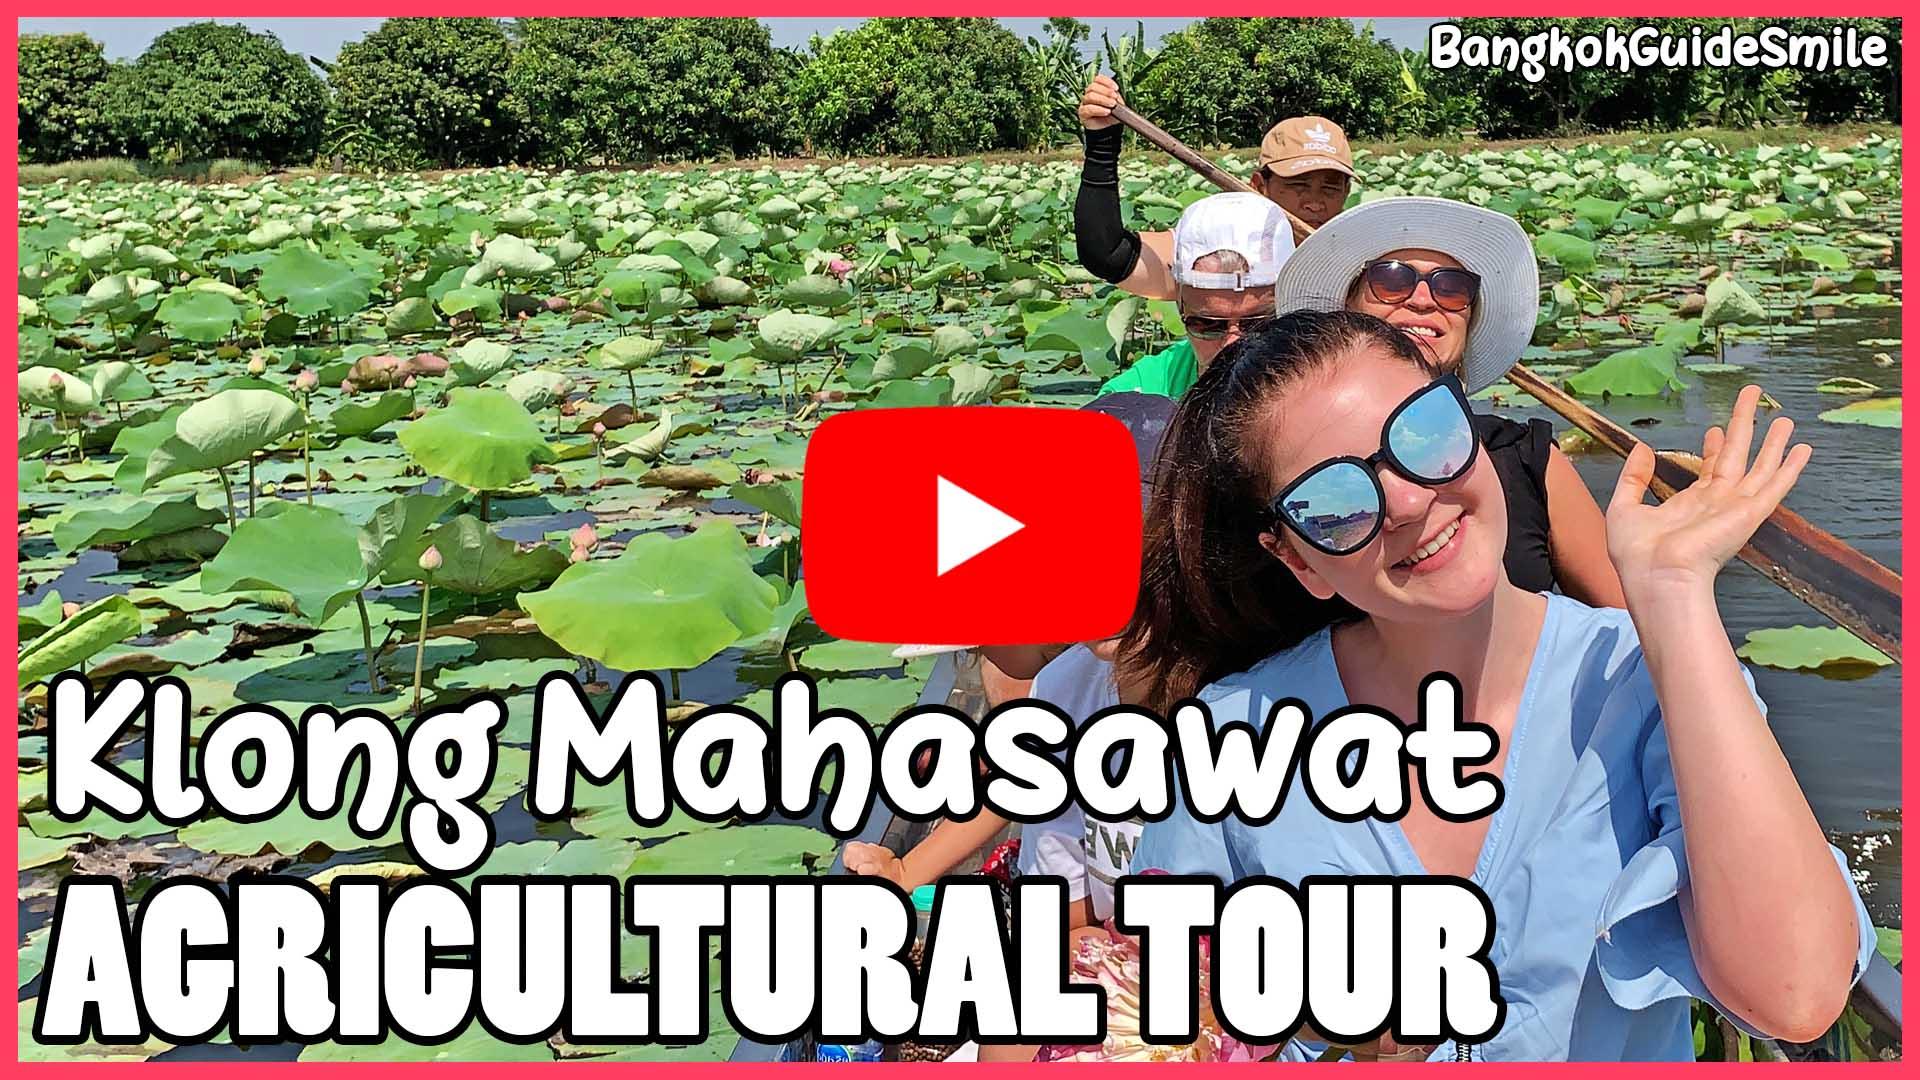 Bangkok-Guide-Smile-Private-Tour-Agricultural-Klong-Mahasawat-02.jpg